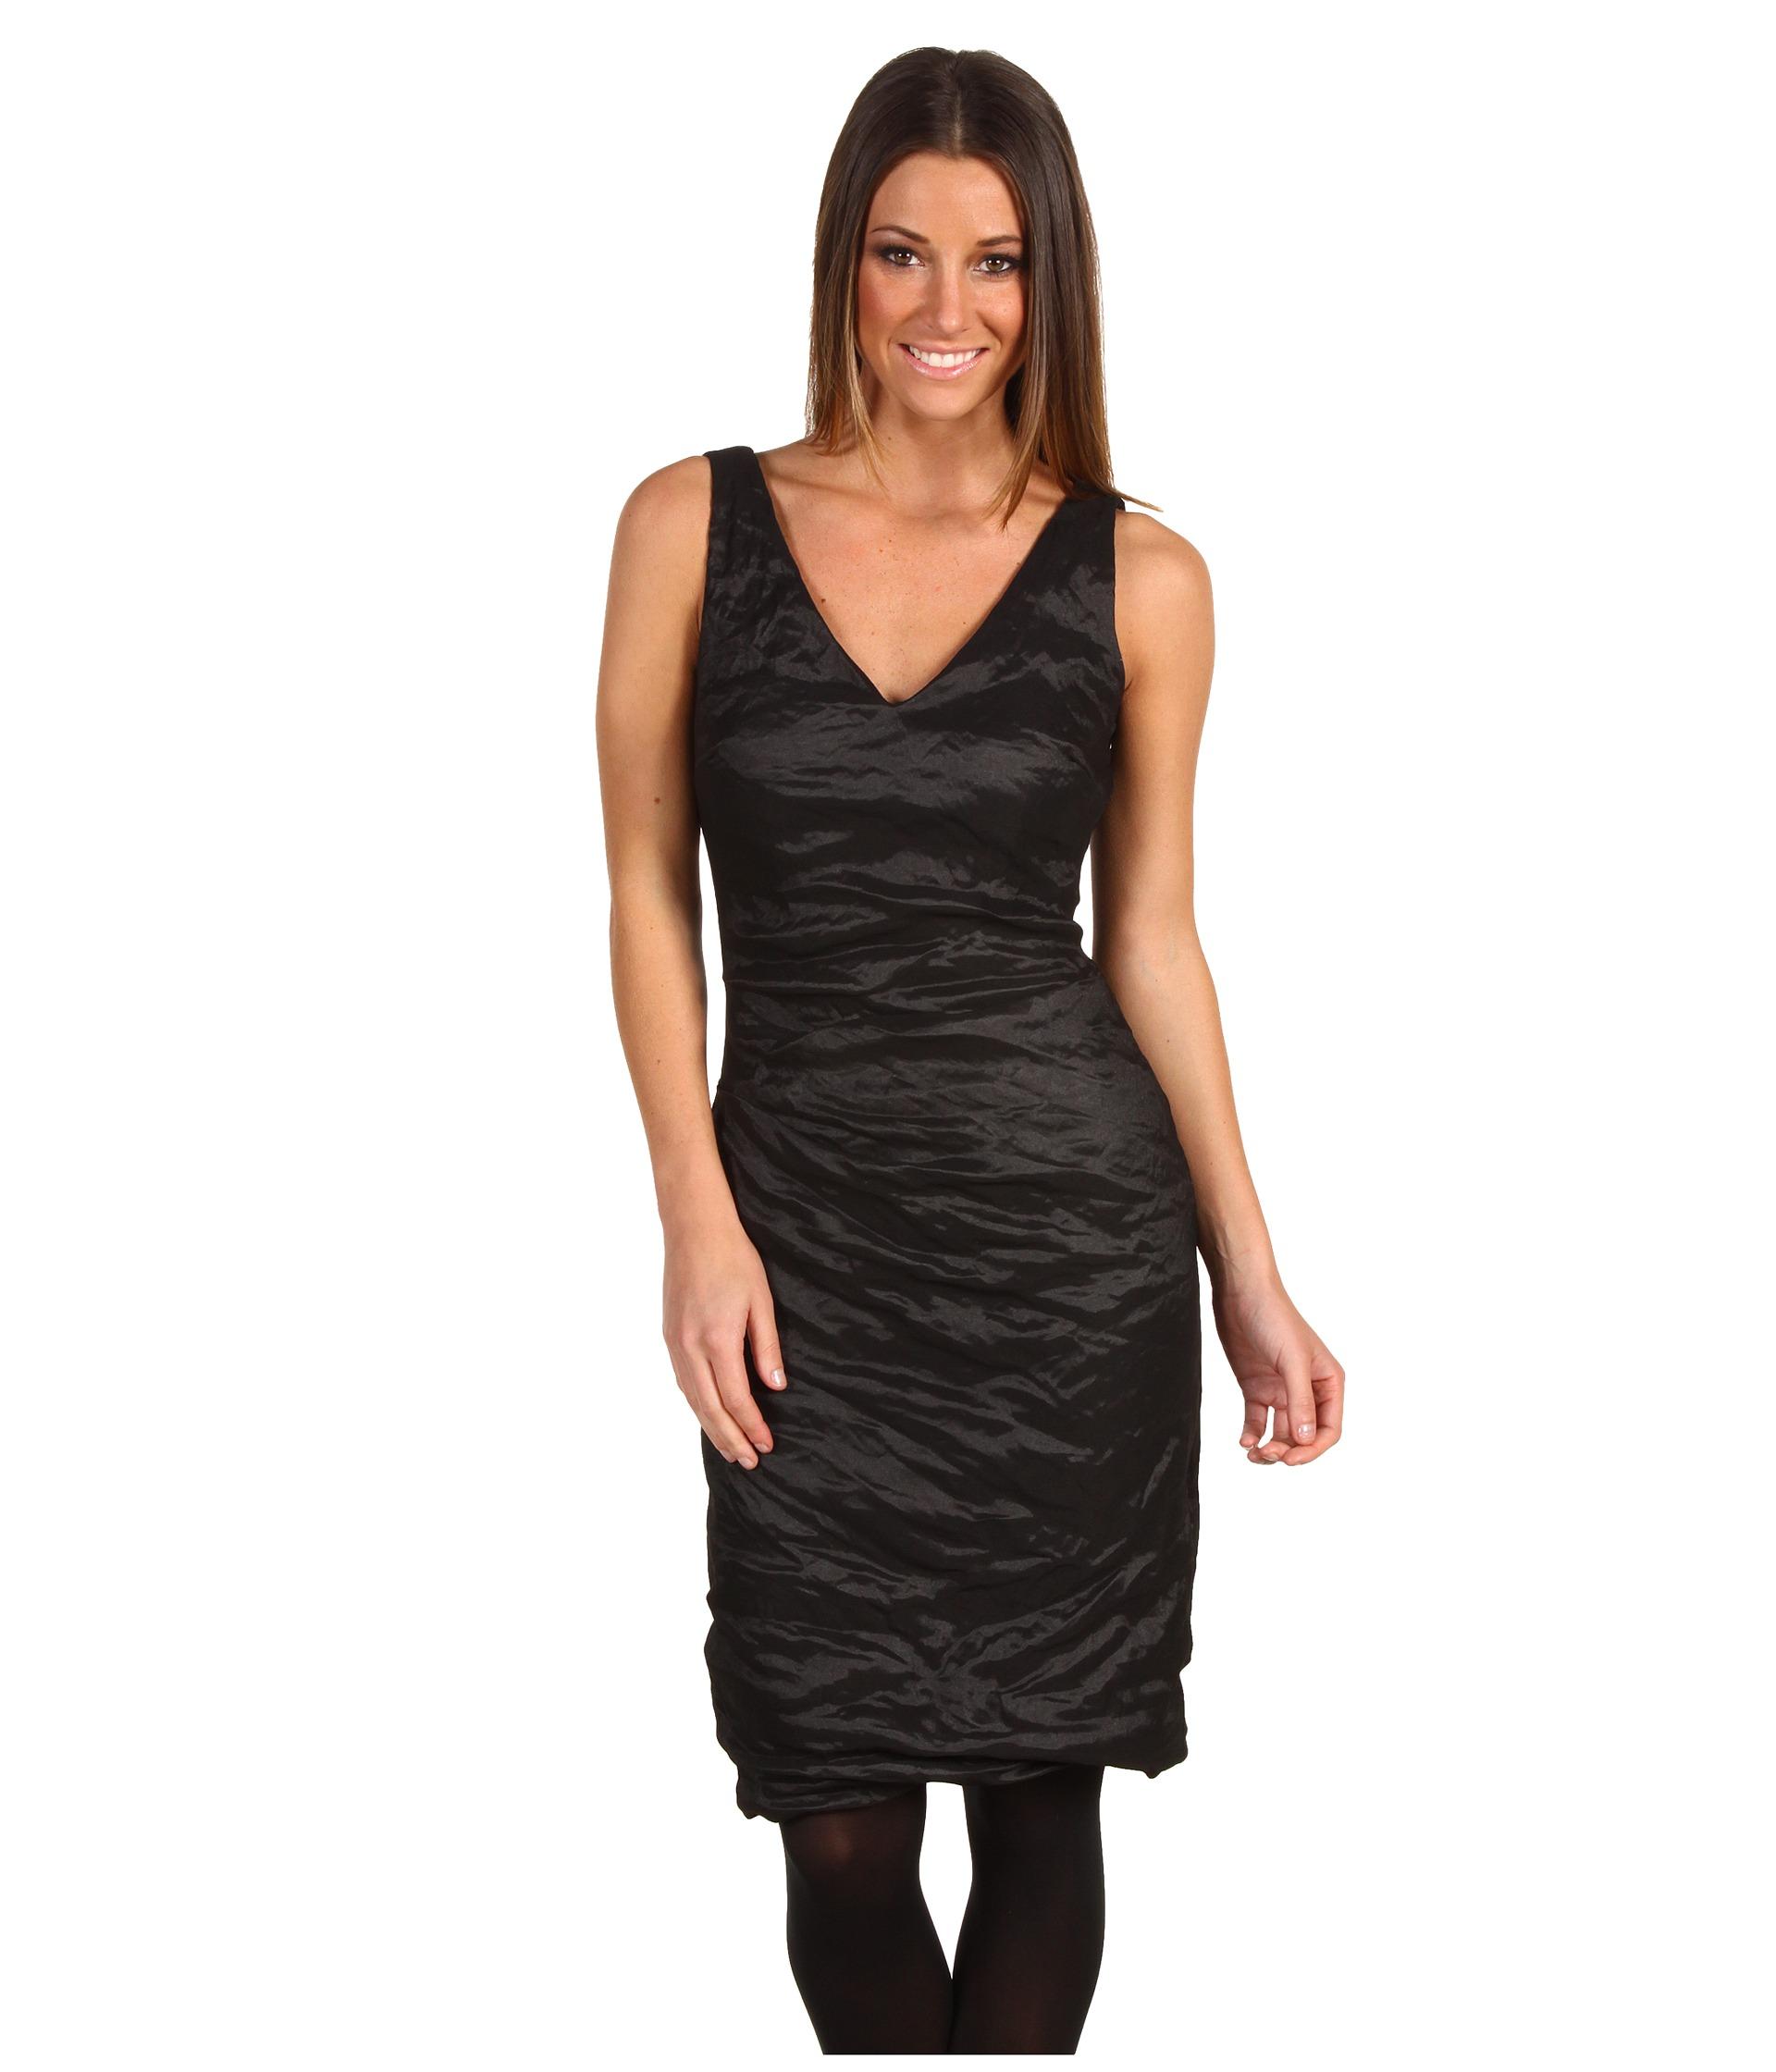 long sleeve dress 6pm returns